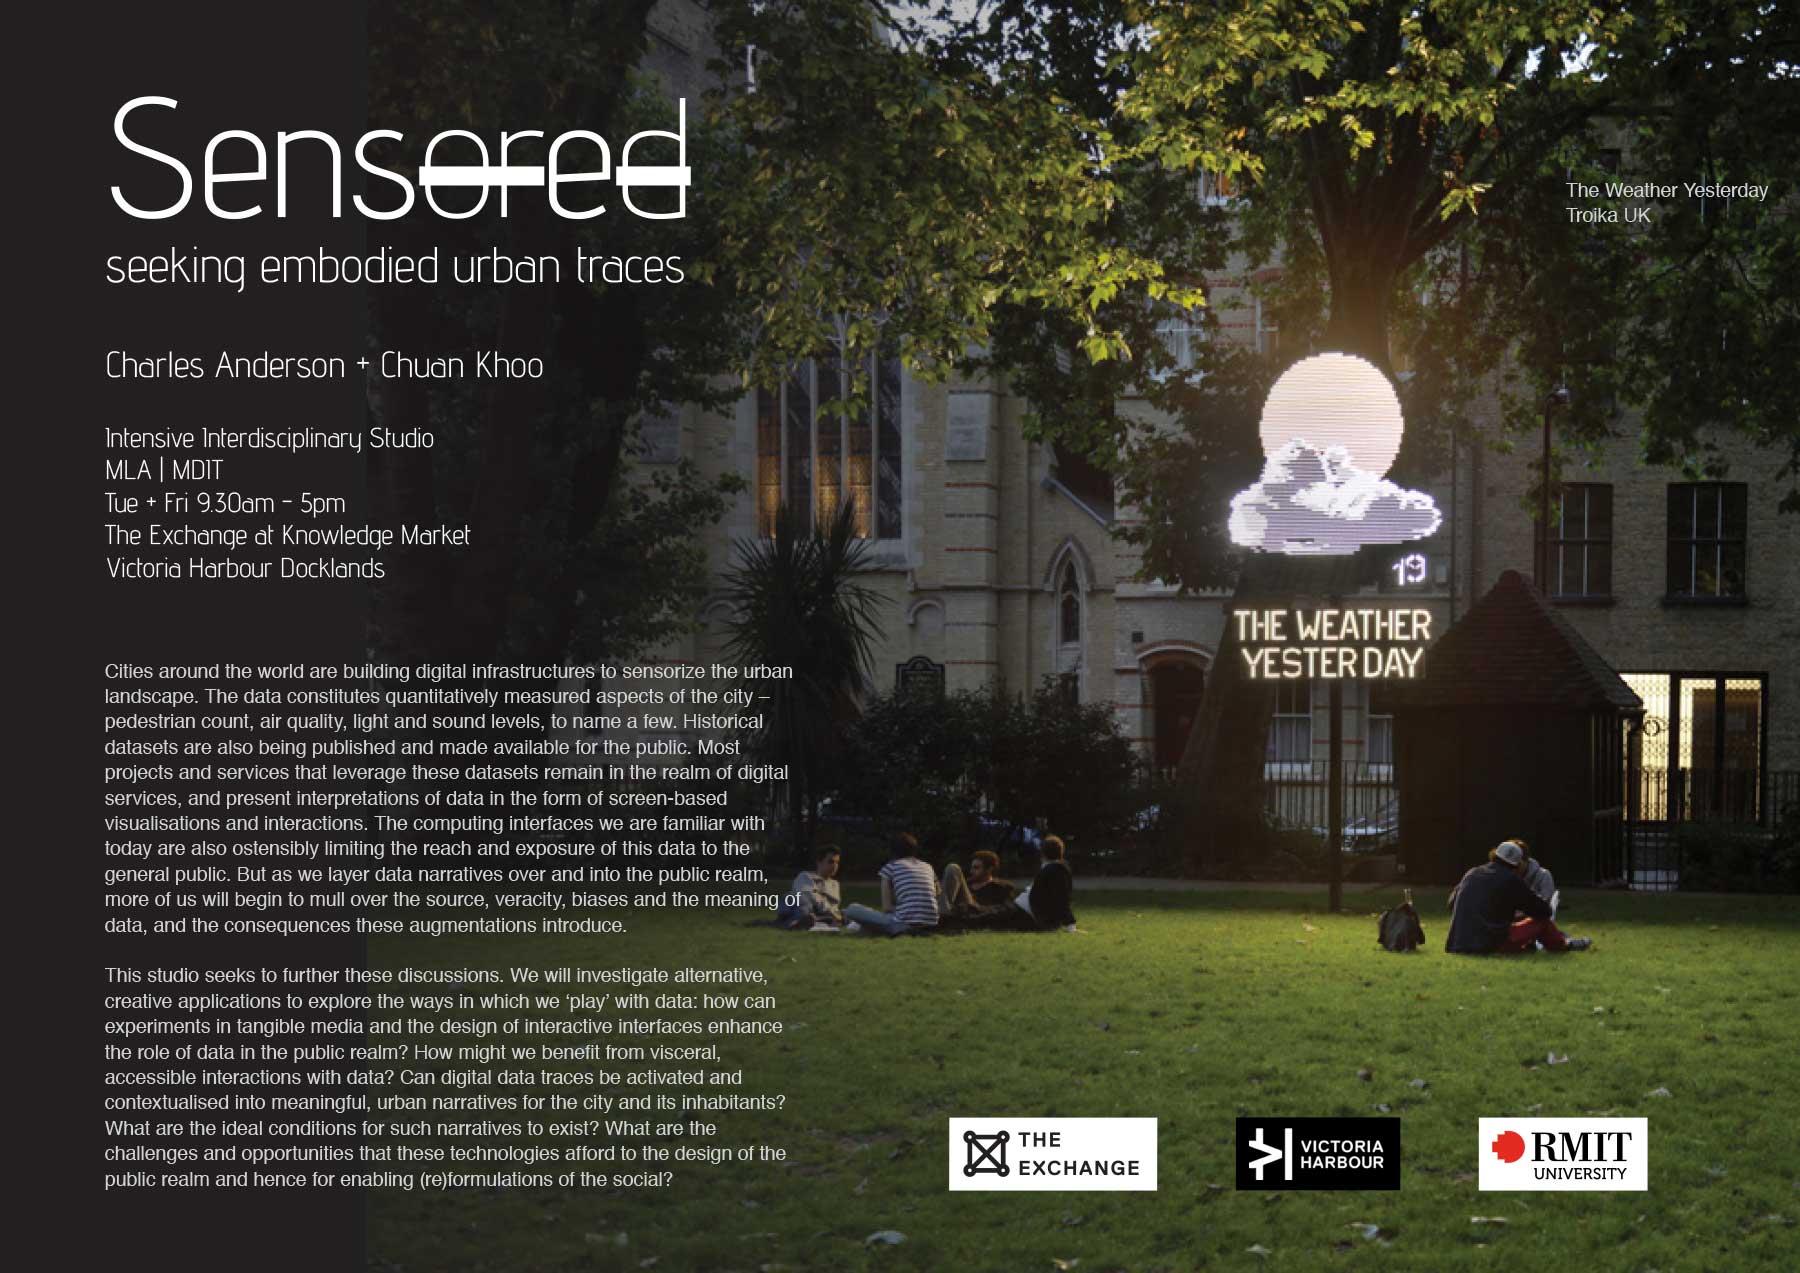 Sensored_poster_final.jpg